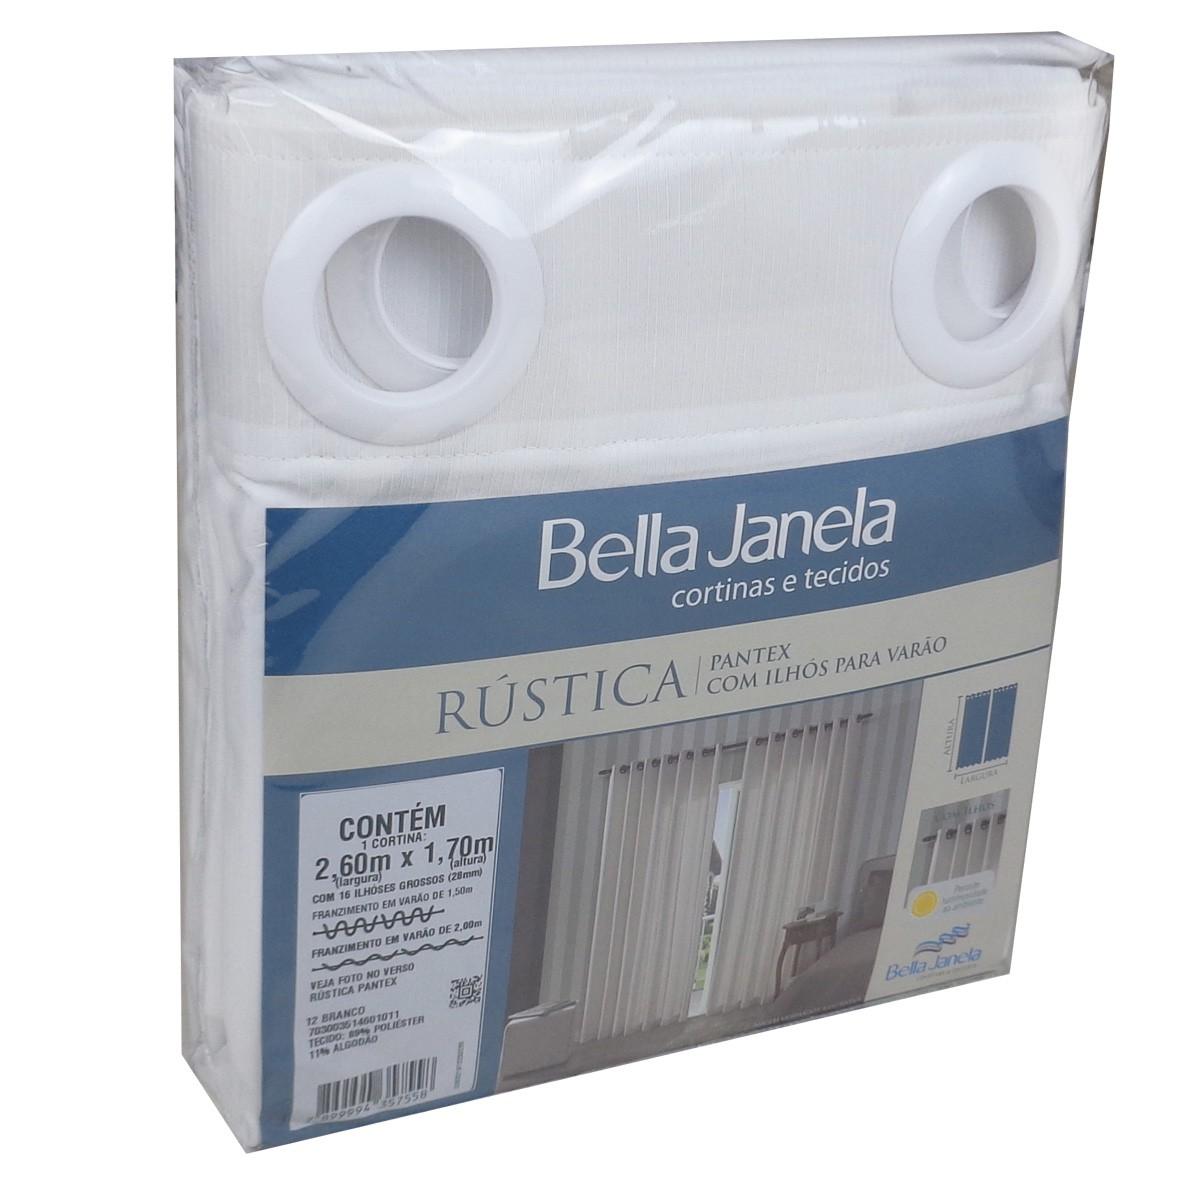 Cortina Para Sala Rústica Pantex Branca 2,60 x 1,70 Bella Janela